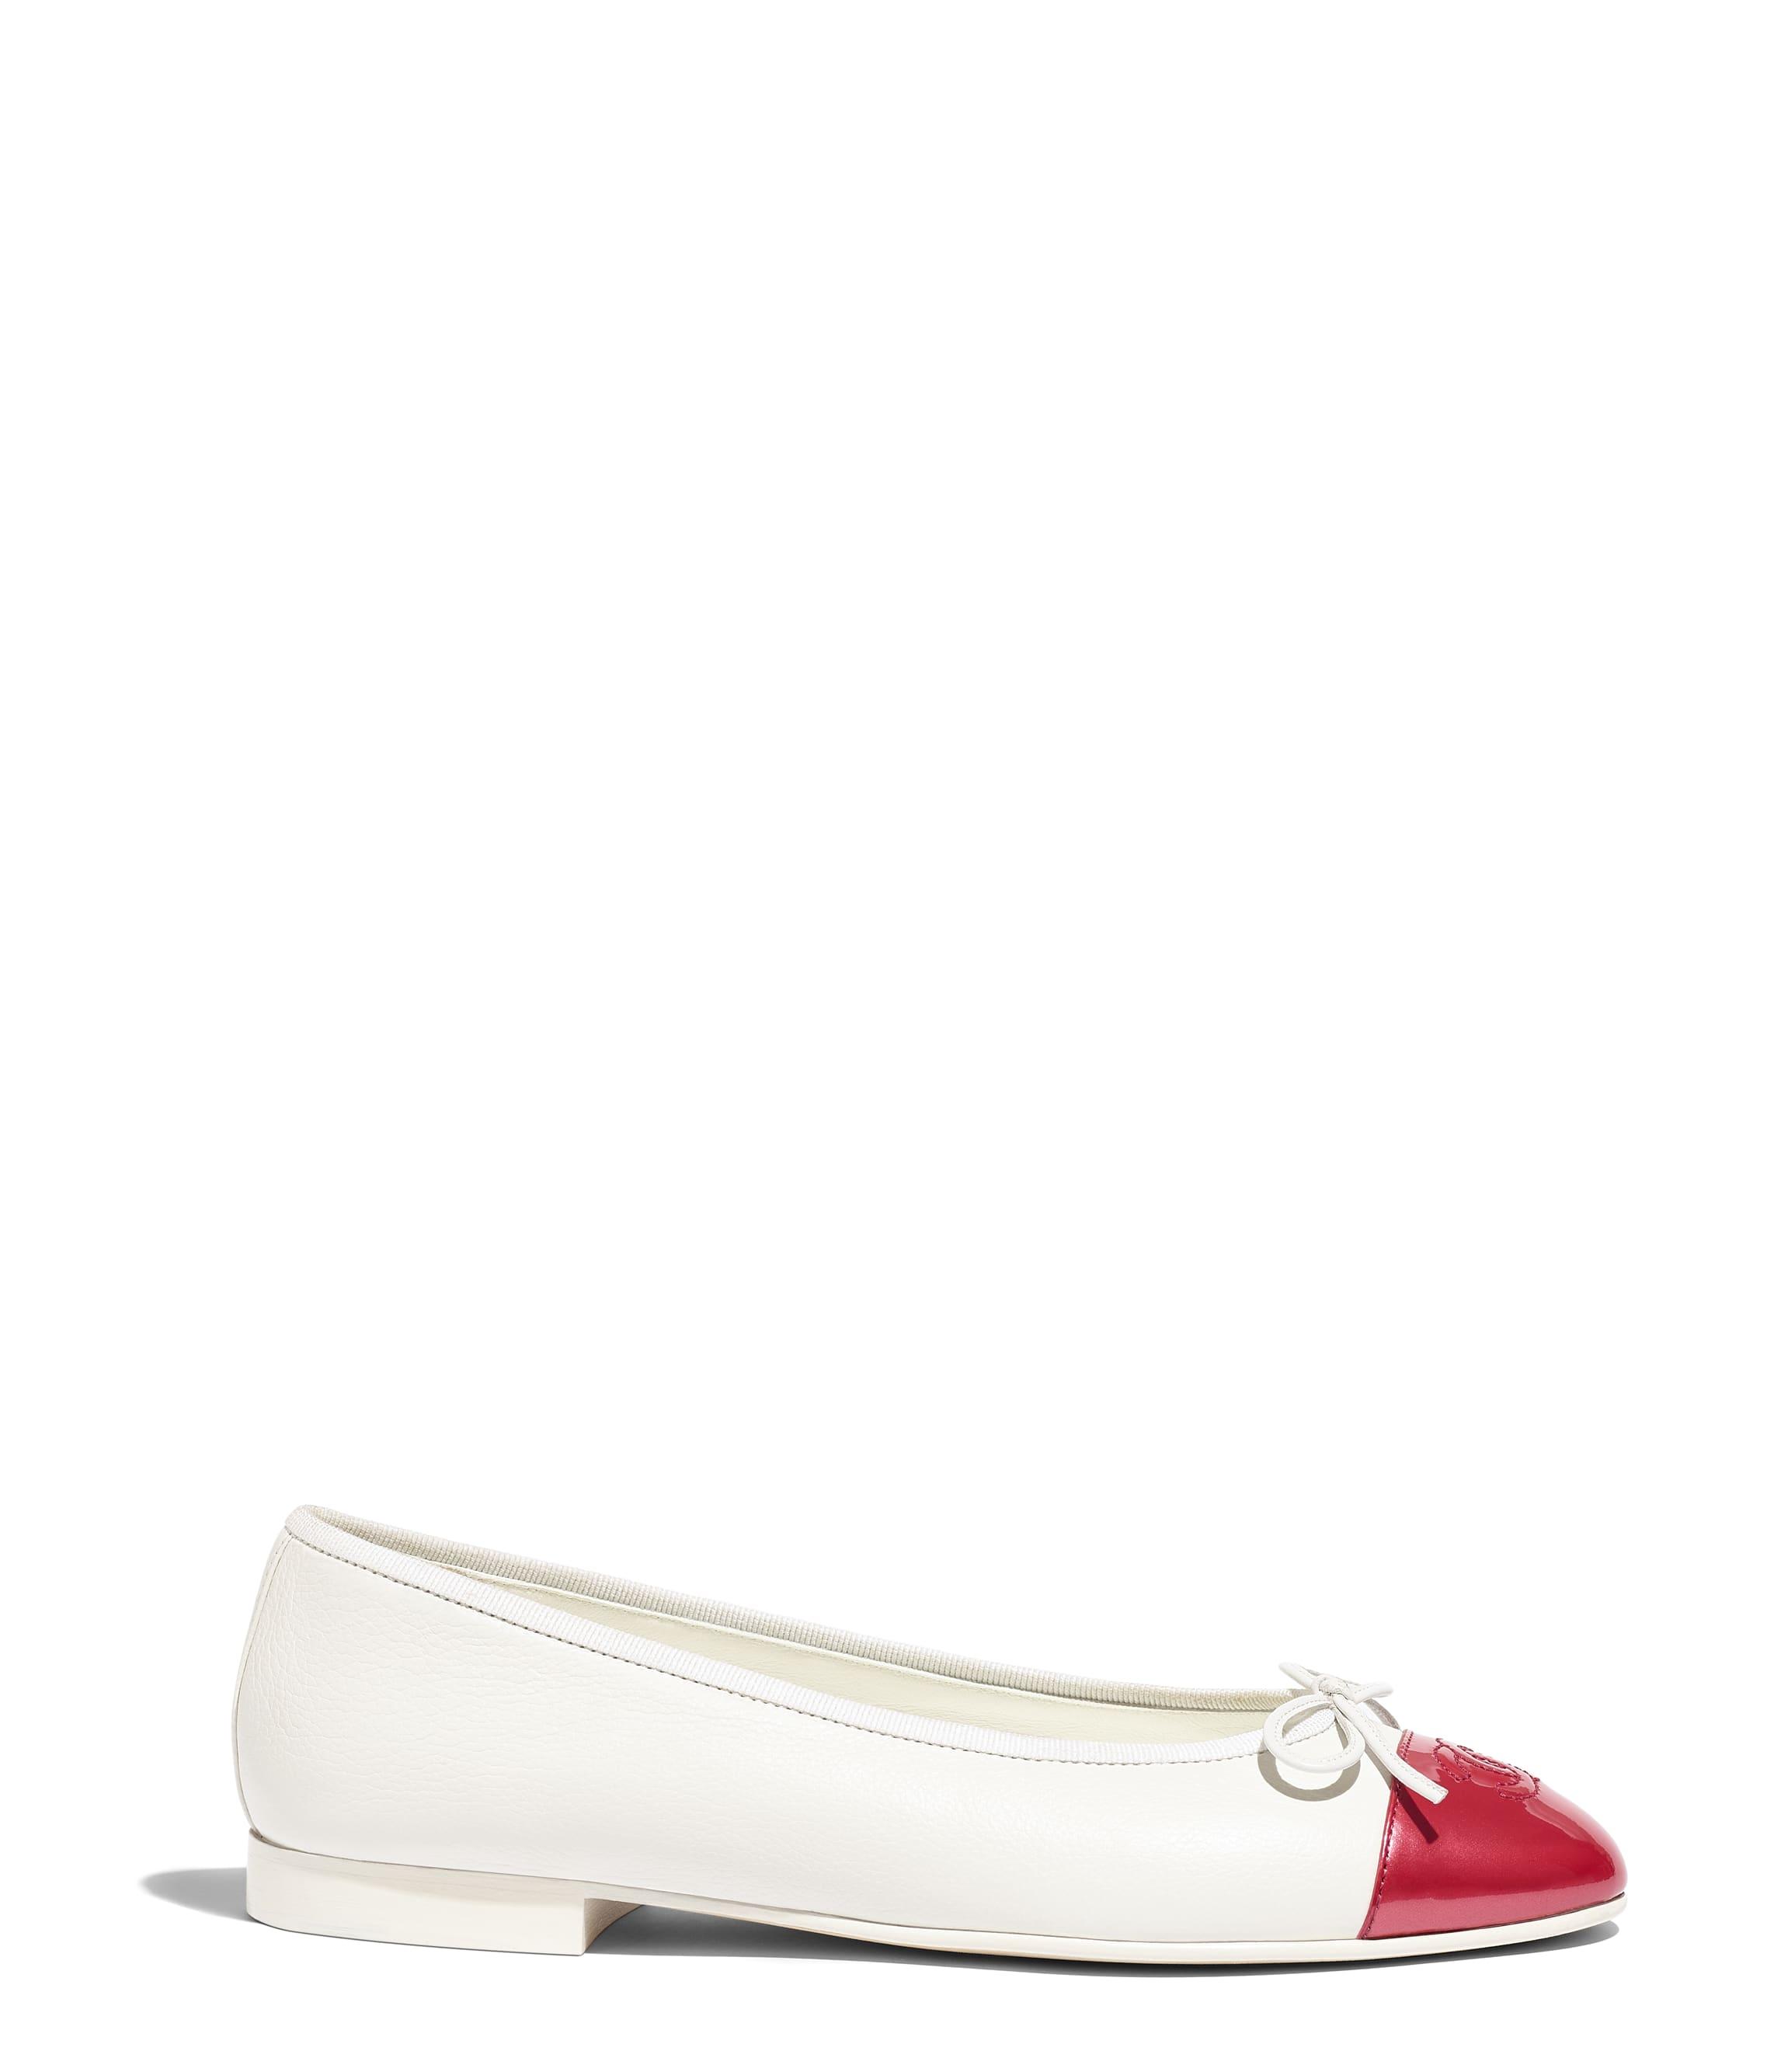 5455d8bfa6a Ballerines - Chaussures - CHANEL